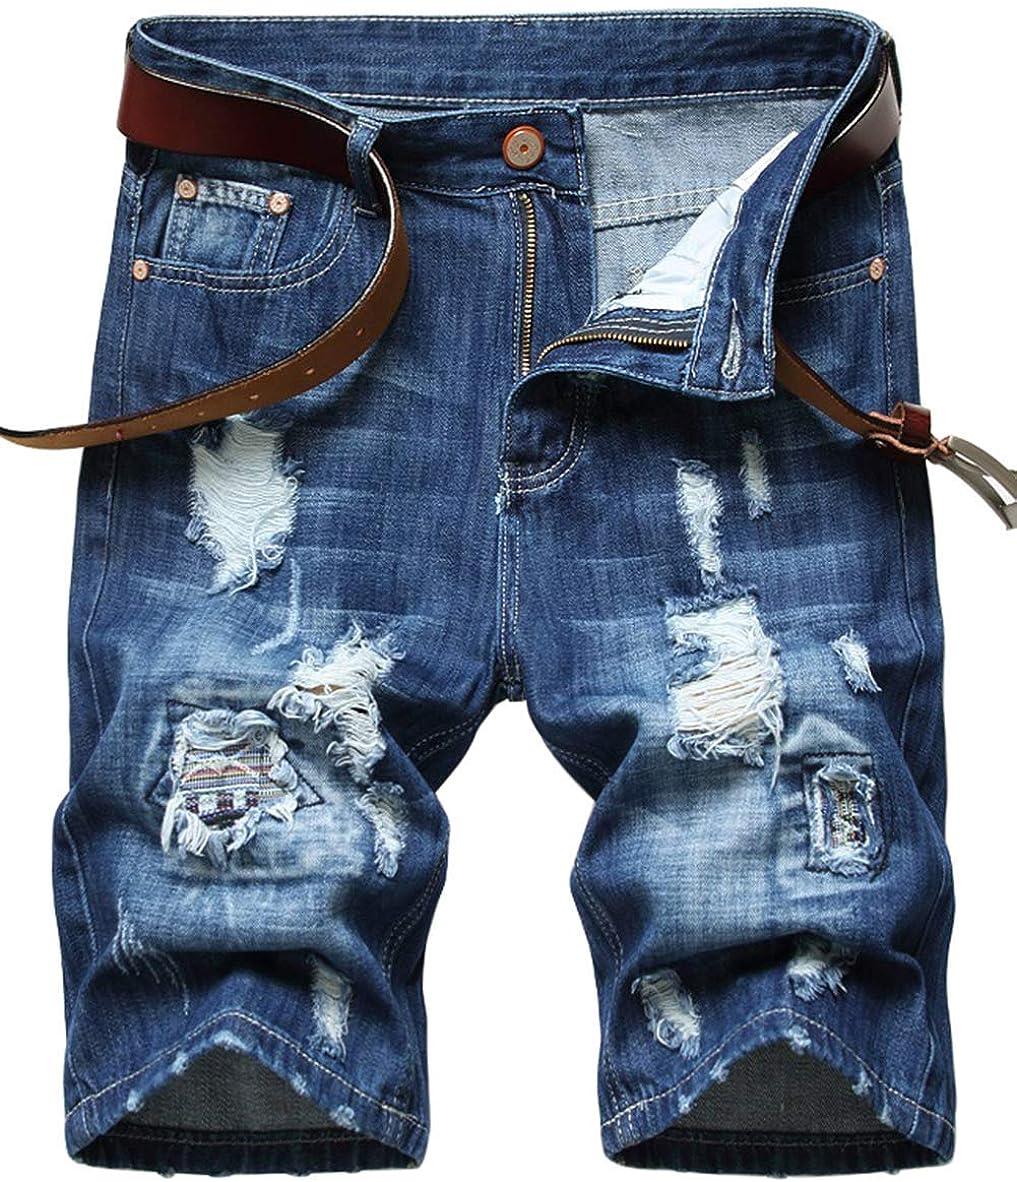 Anbreuinron Men's Casual Ripped Denim Jeans Shorts Straight Leg Slim Fit Summer Denim Shorts